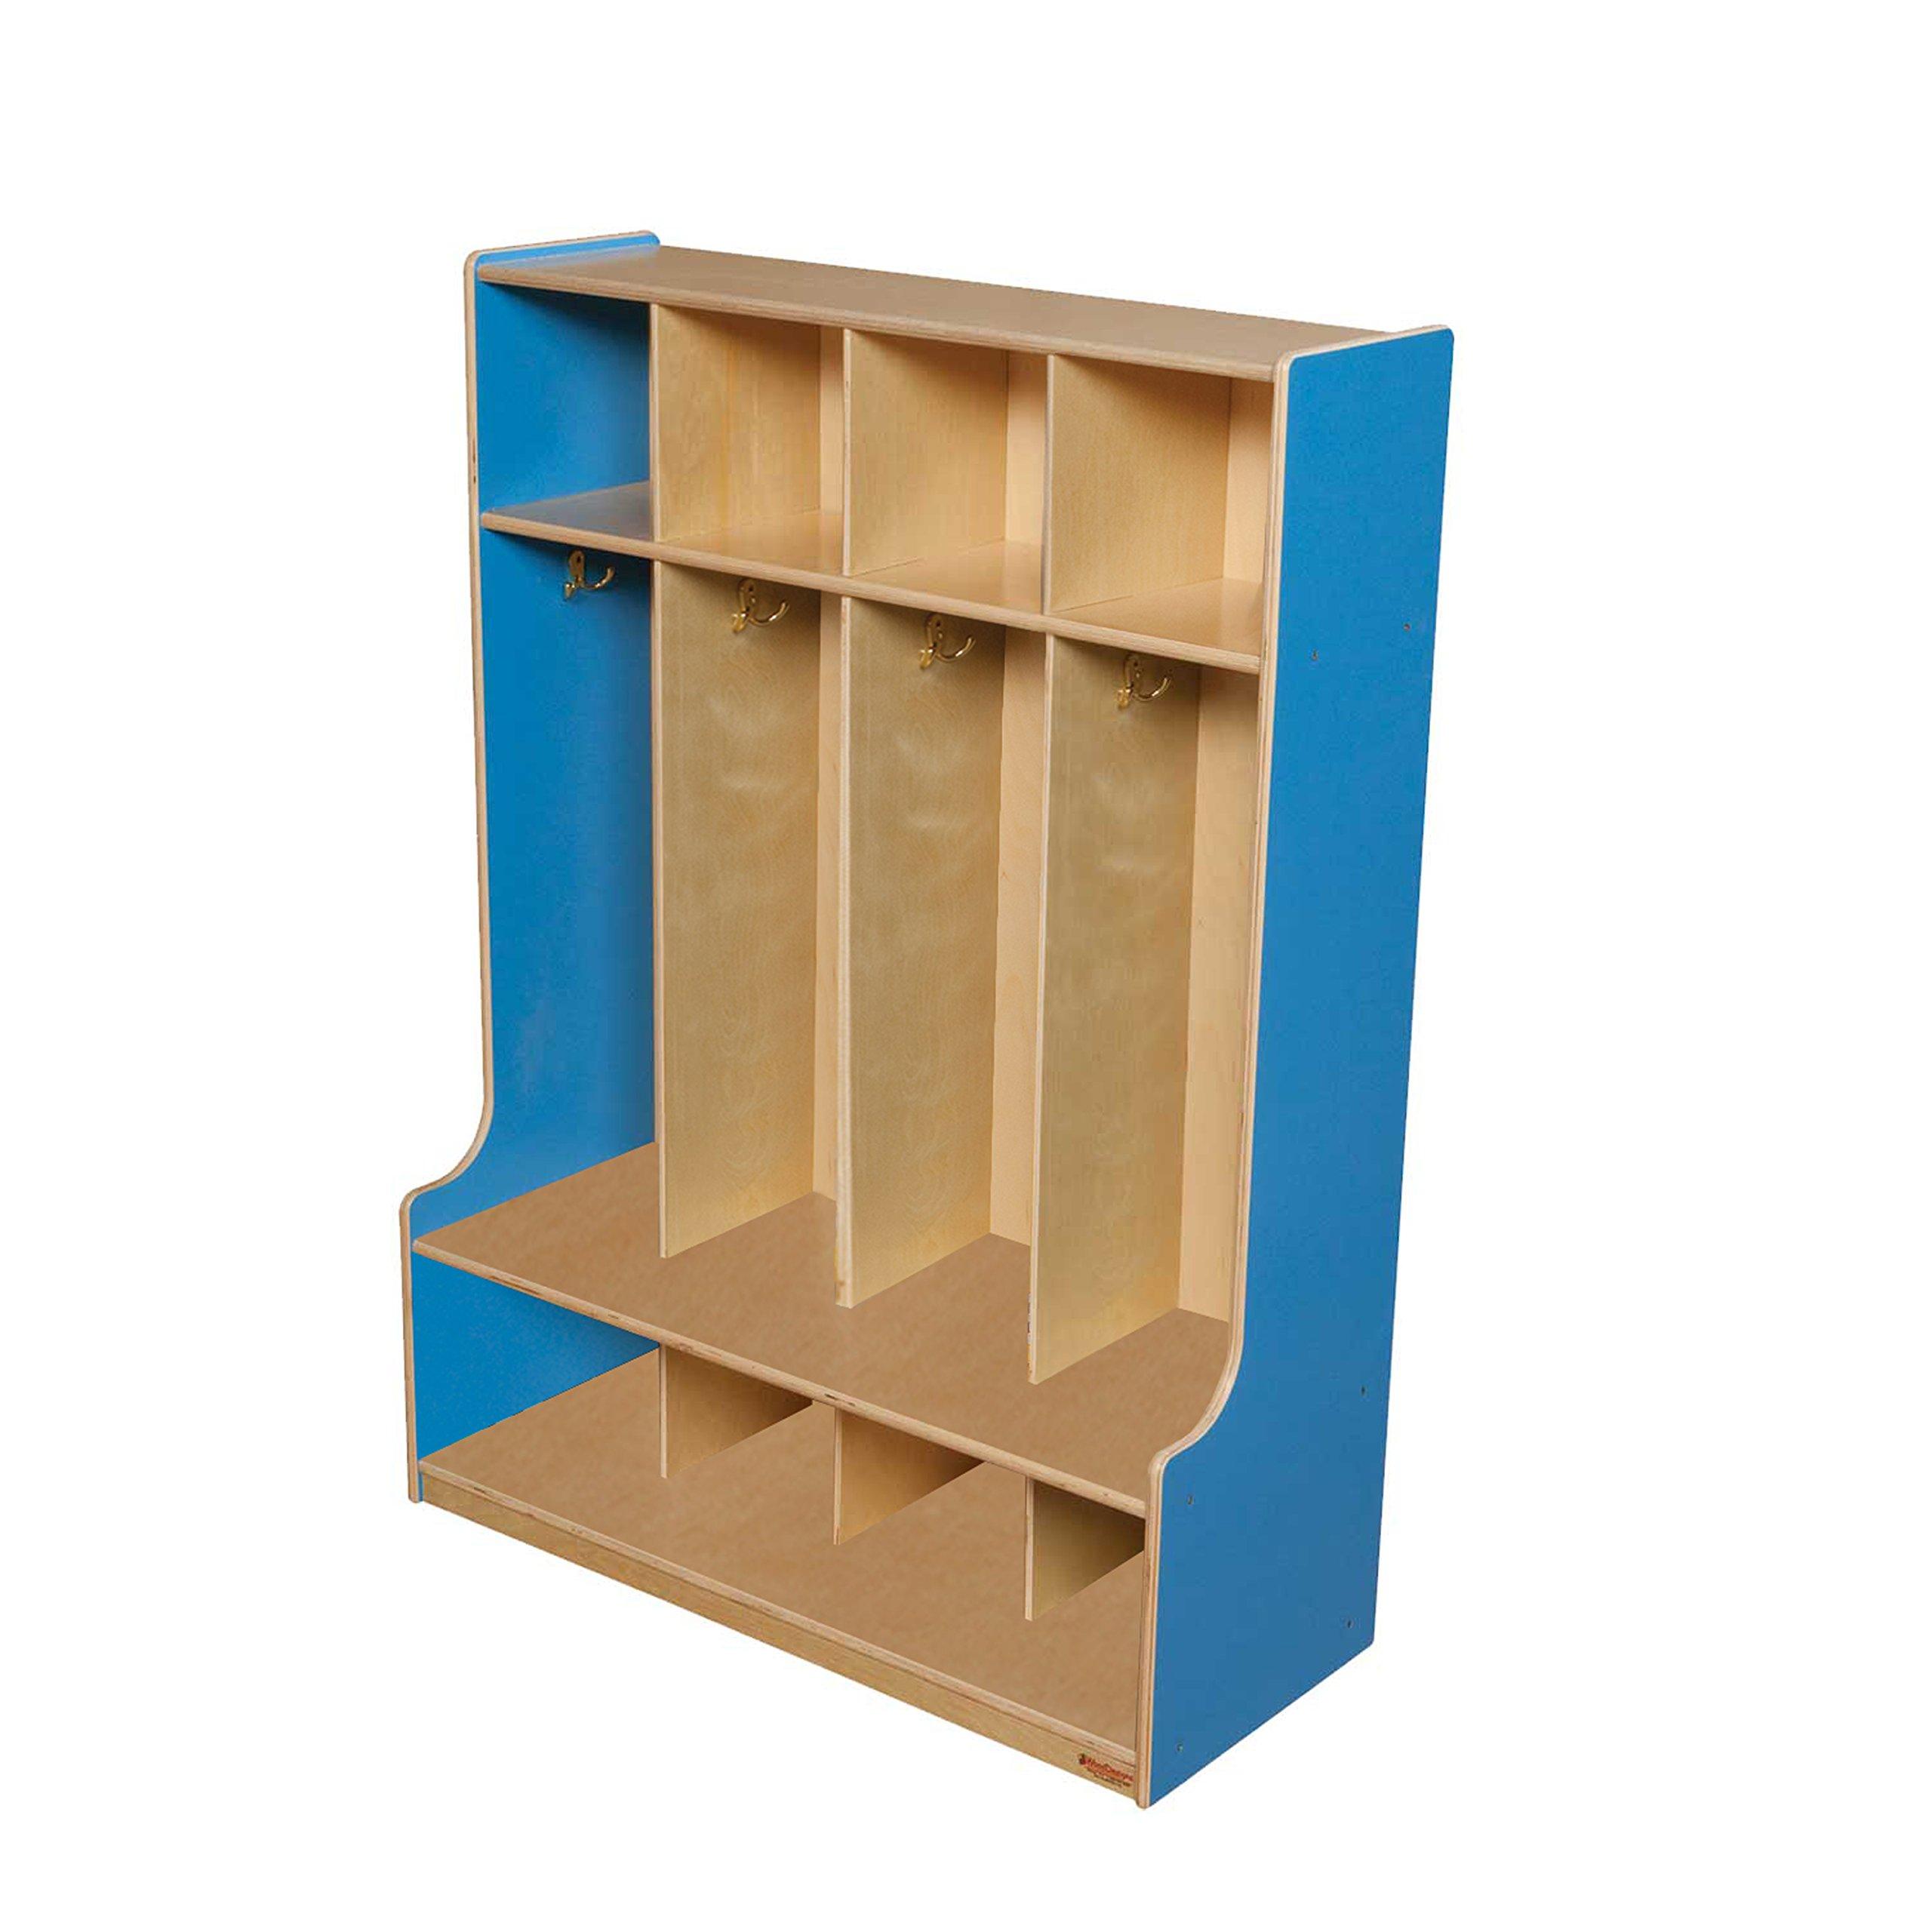 Wood Designs 51004B Blueberry 4 Section Seat Locker, 49'' Height, 18'' Width, 51.5'' Length